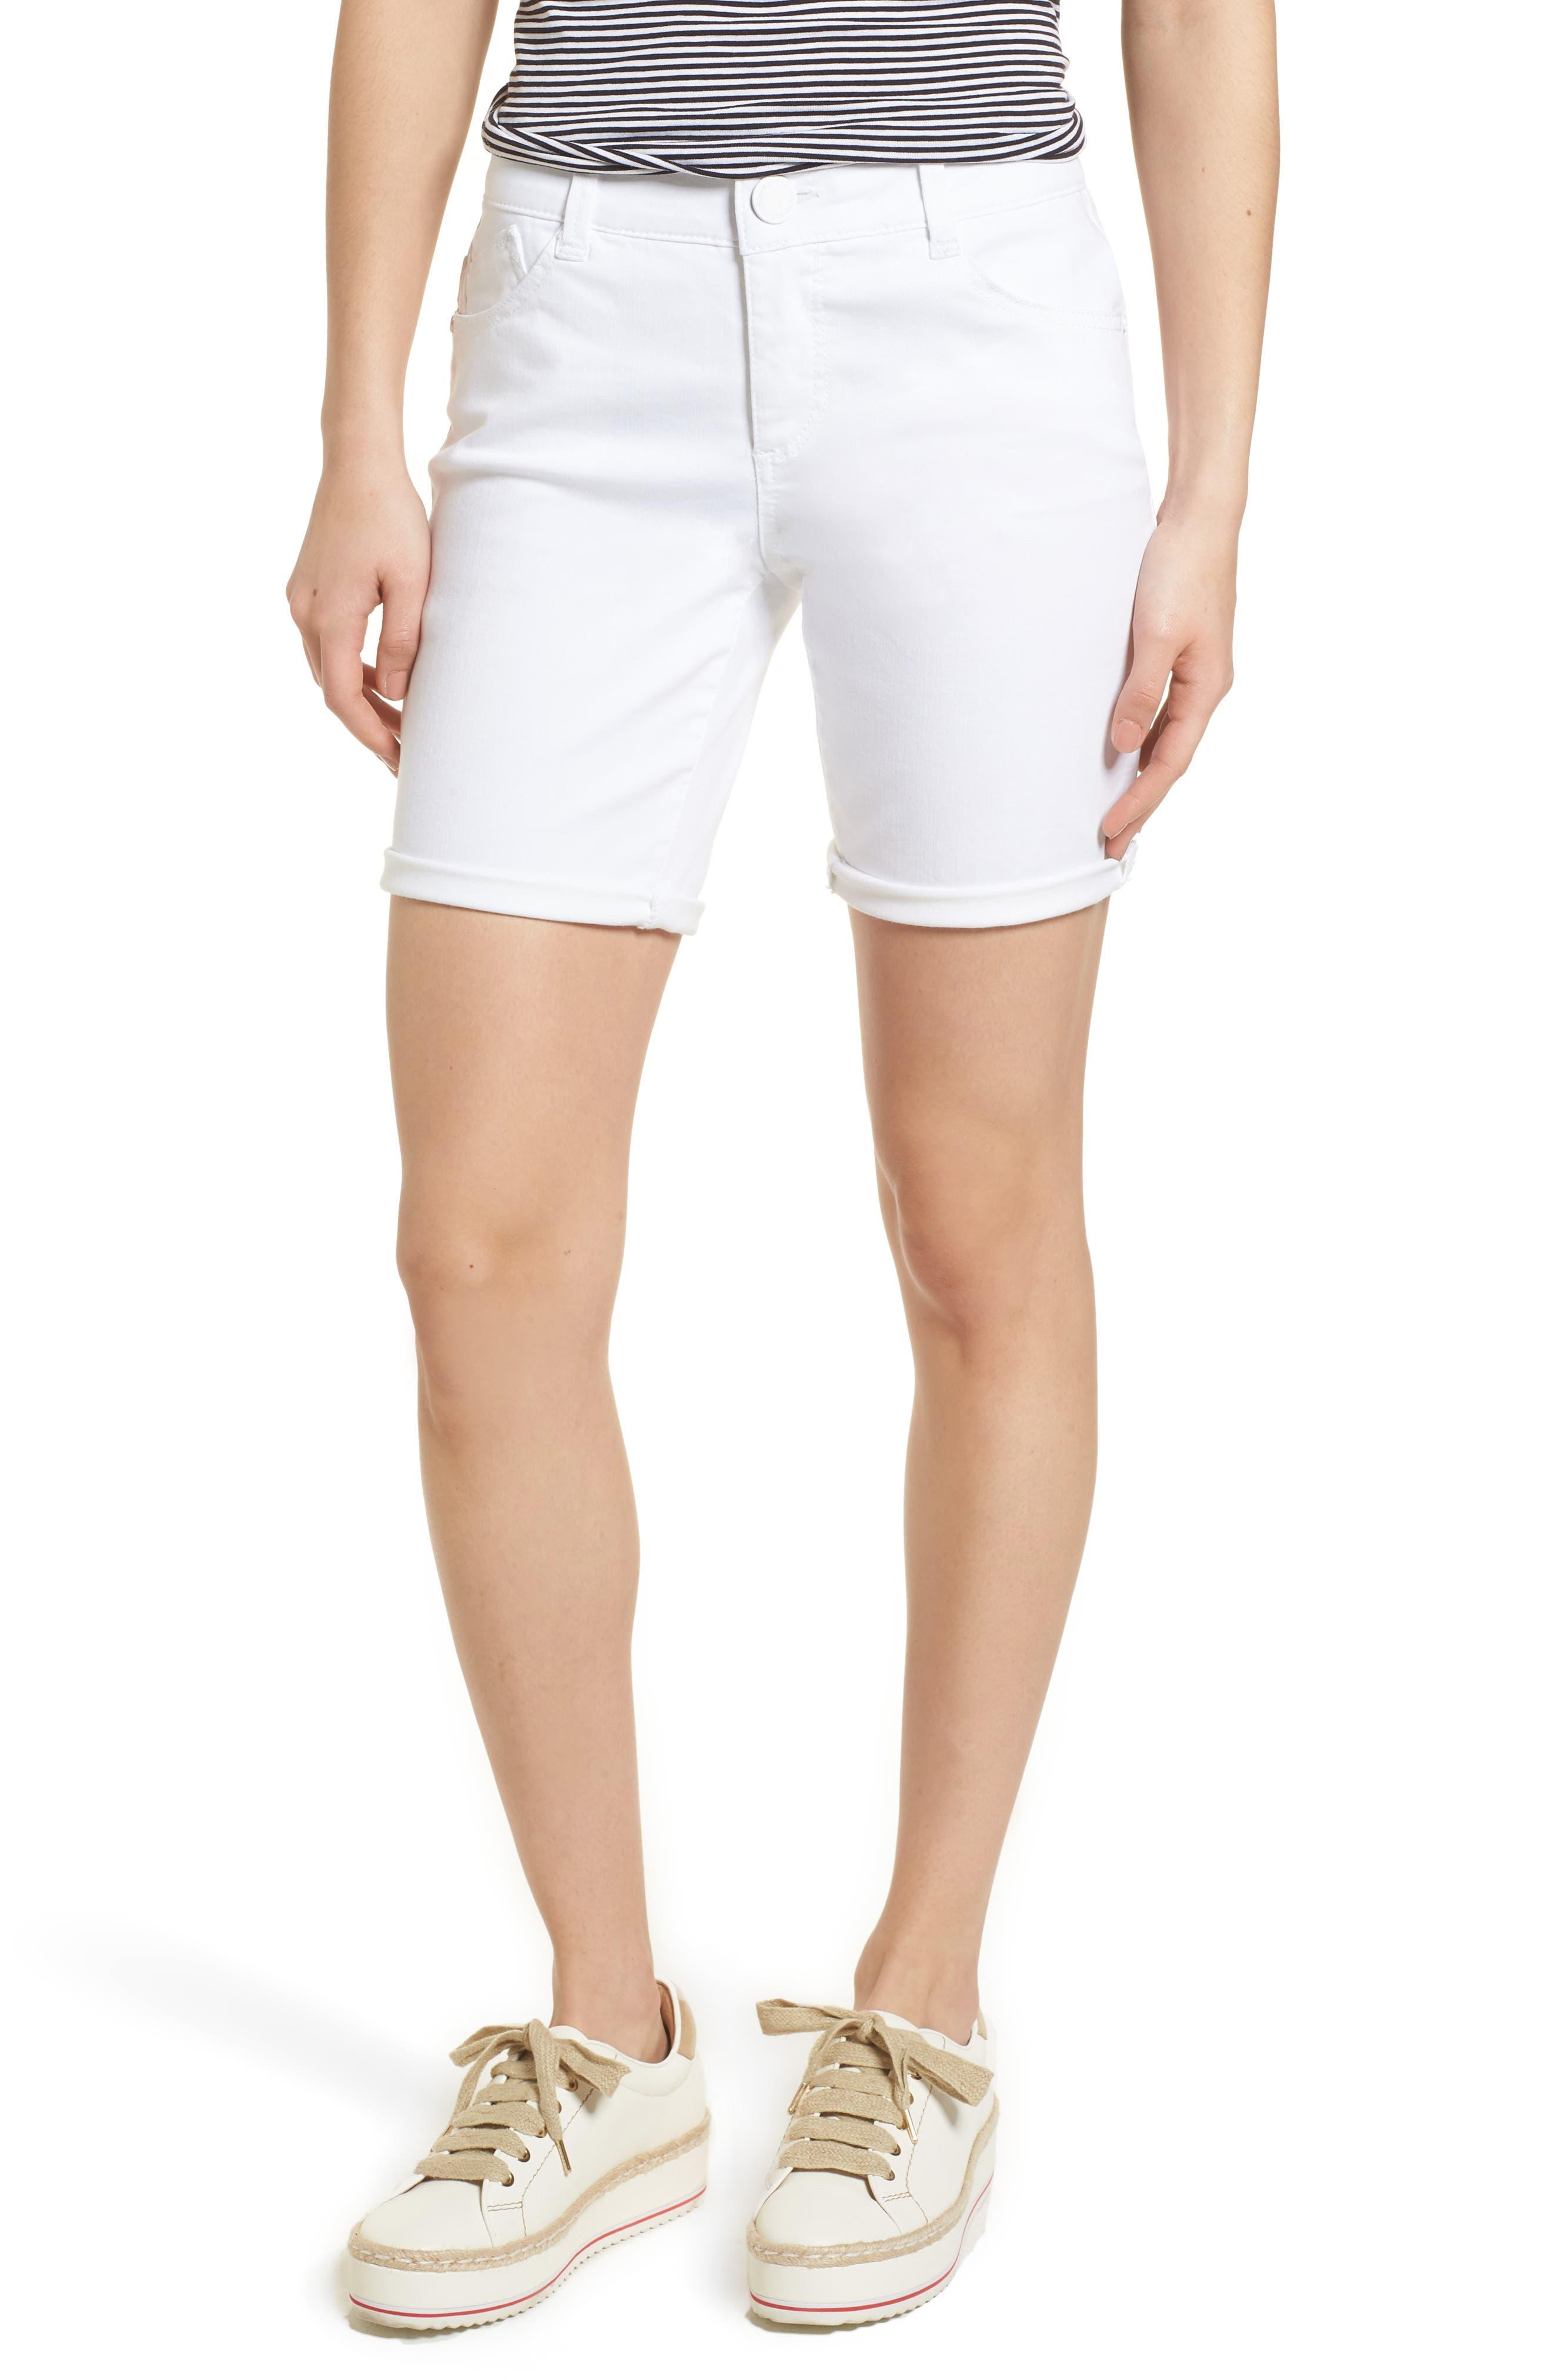 Ab-Solution White Denim Shorts,                         Main,                         color, Optic White